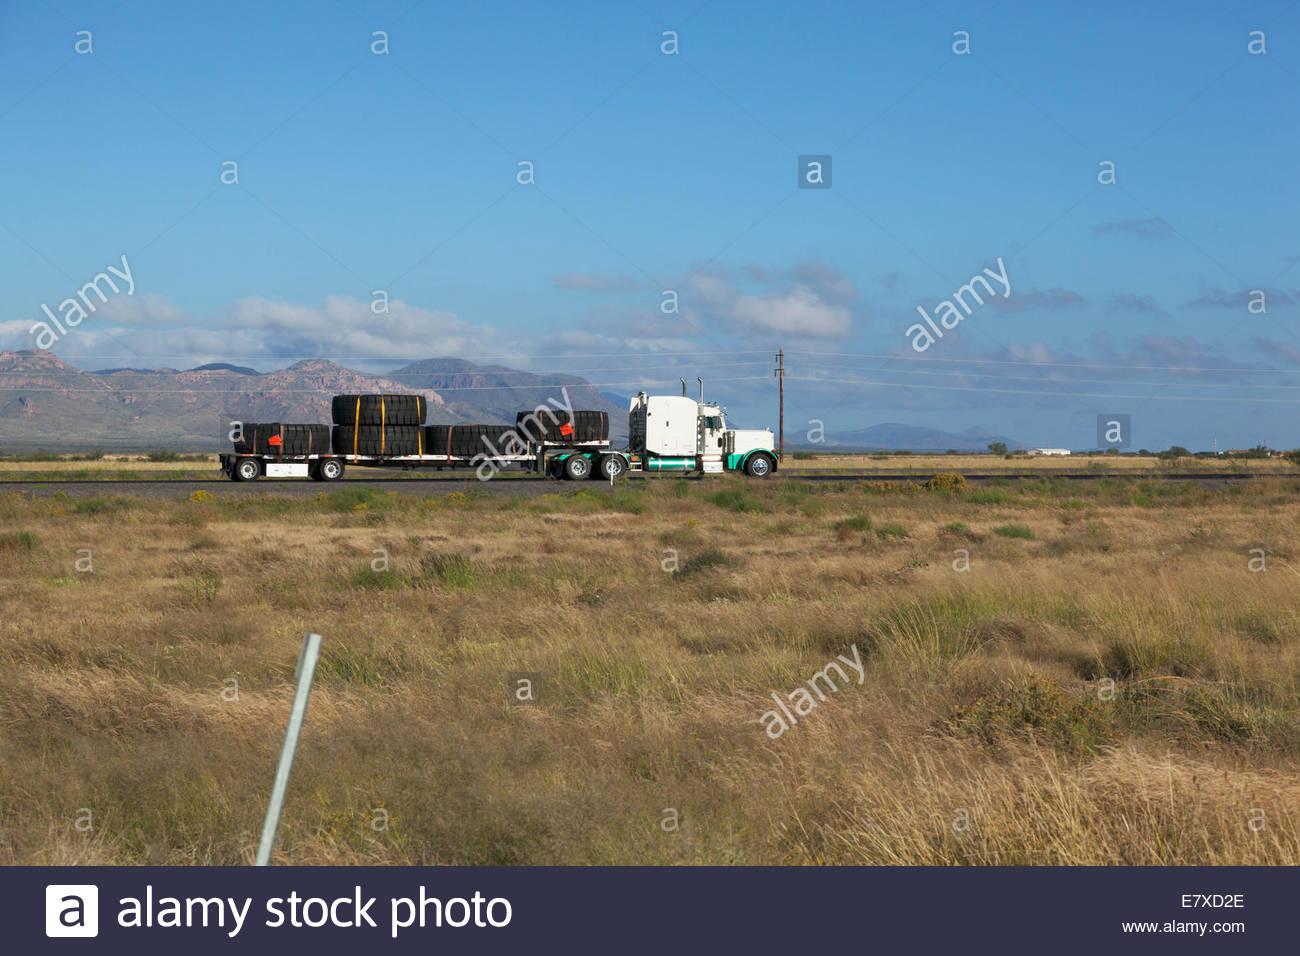 Truck hauling large tires wide load oversize Arizona - Stock Image